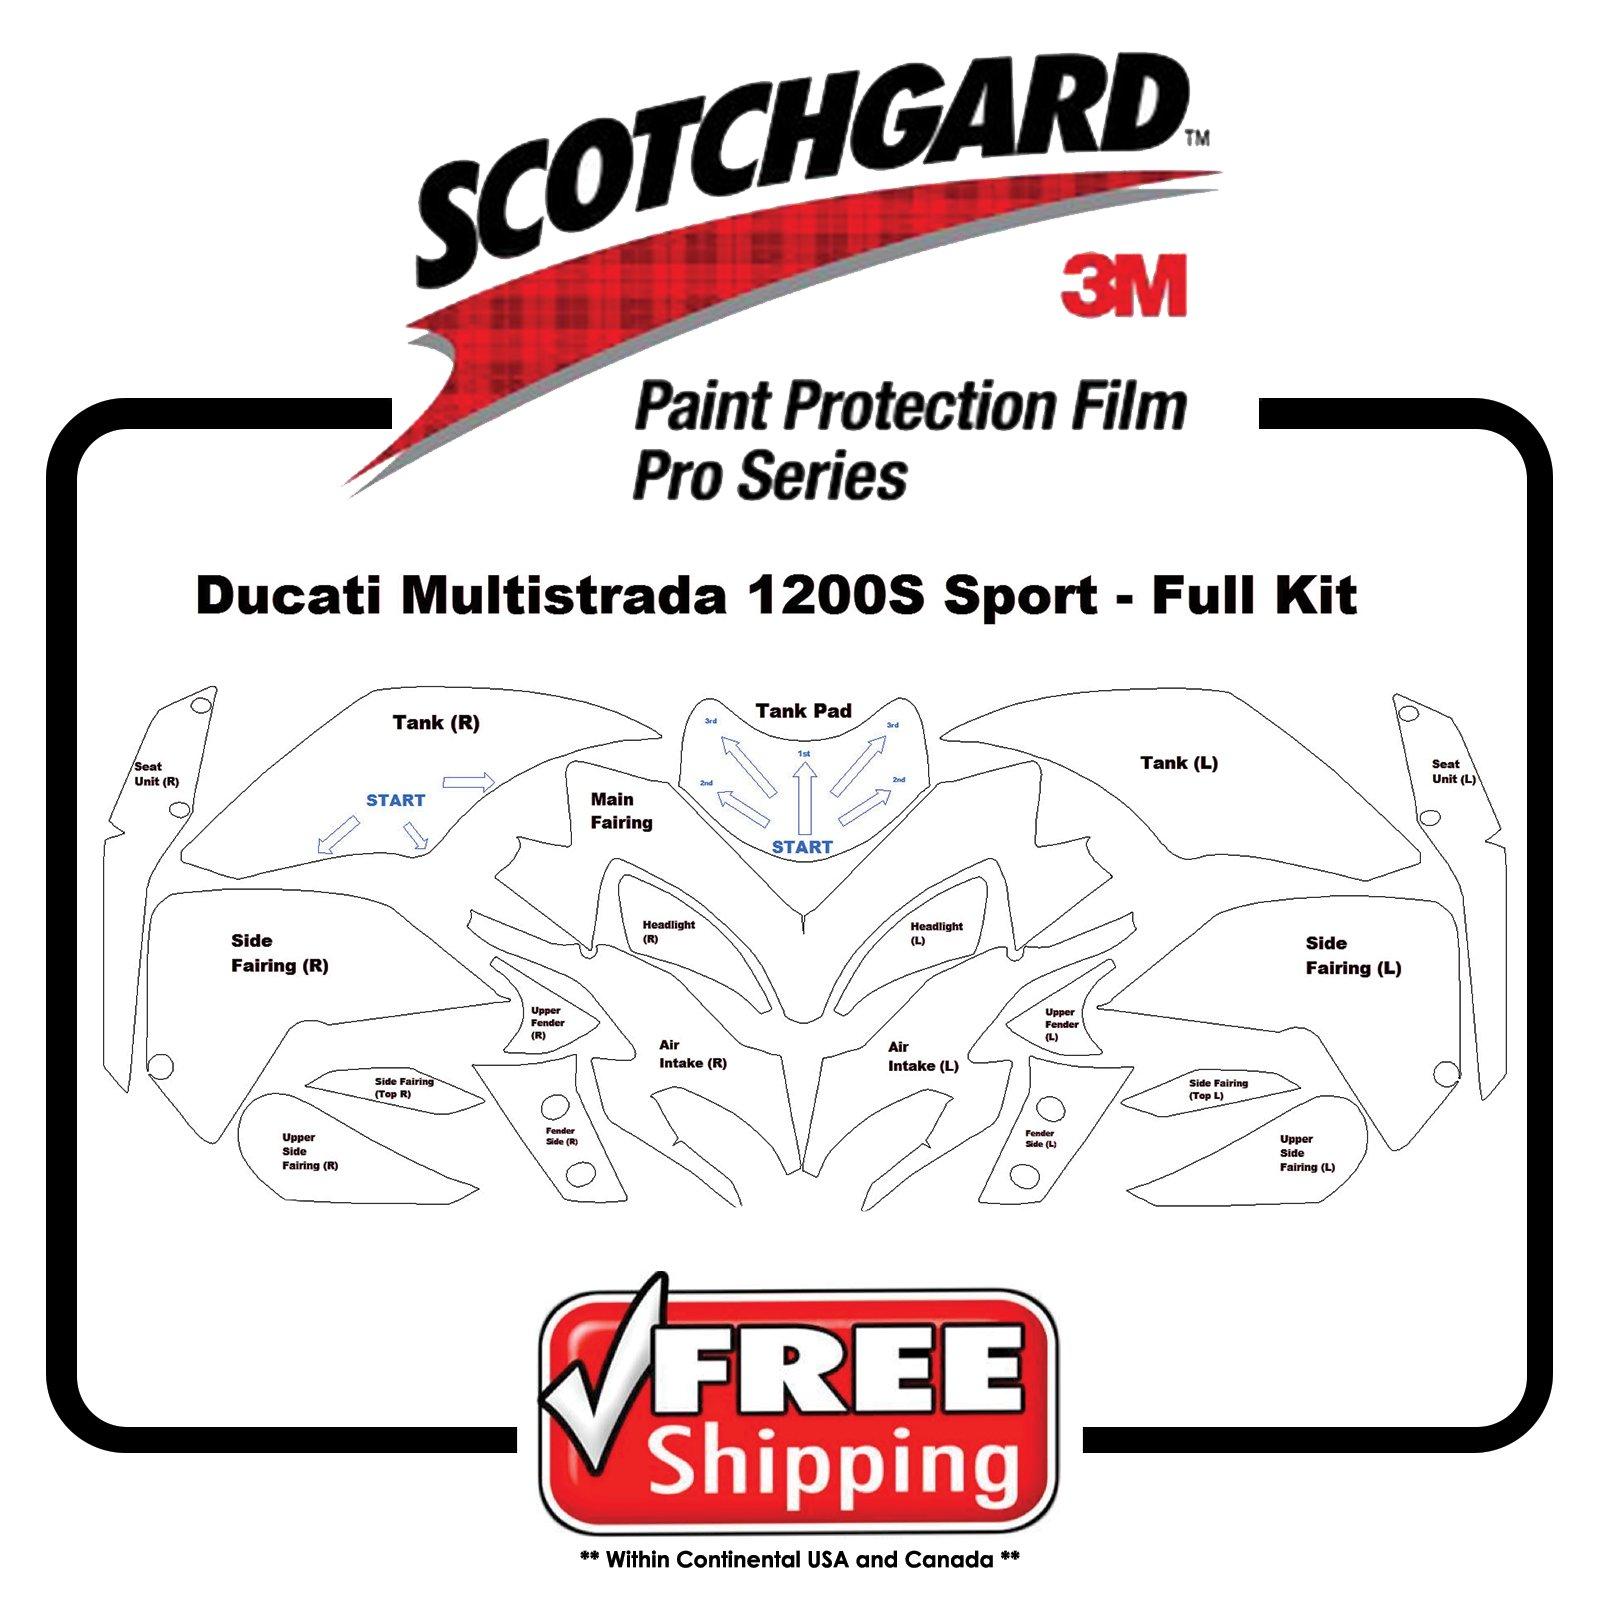 Kits for Ducati Multisrada 1200s Sport - 3M 948 PRO SERIES- Paint Protection by PrintsnPlots